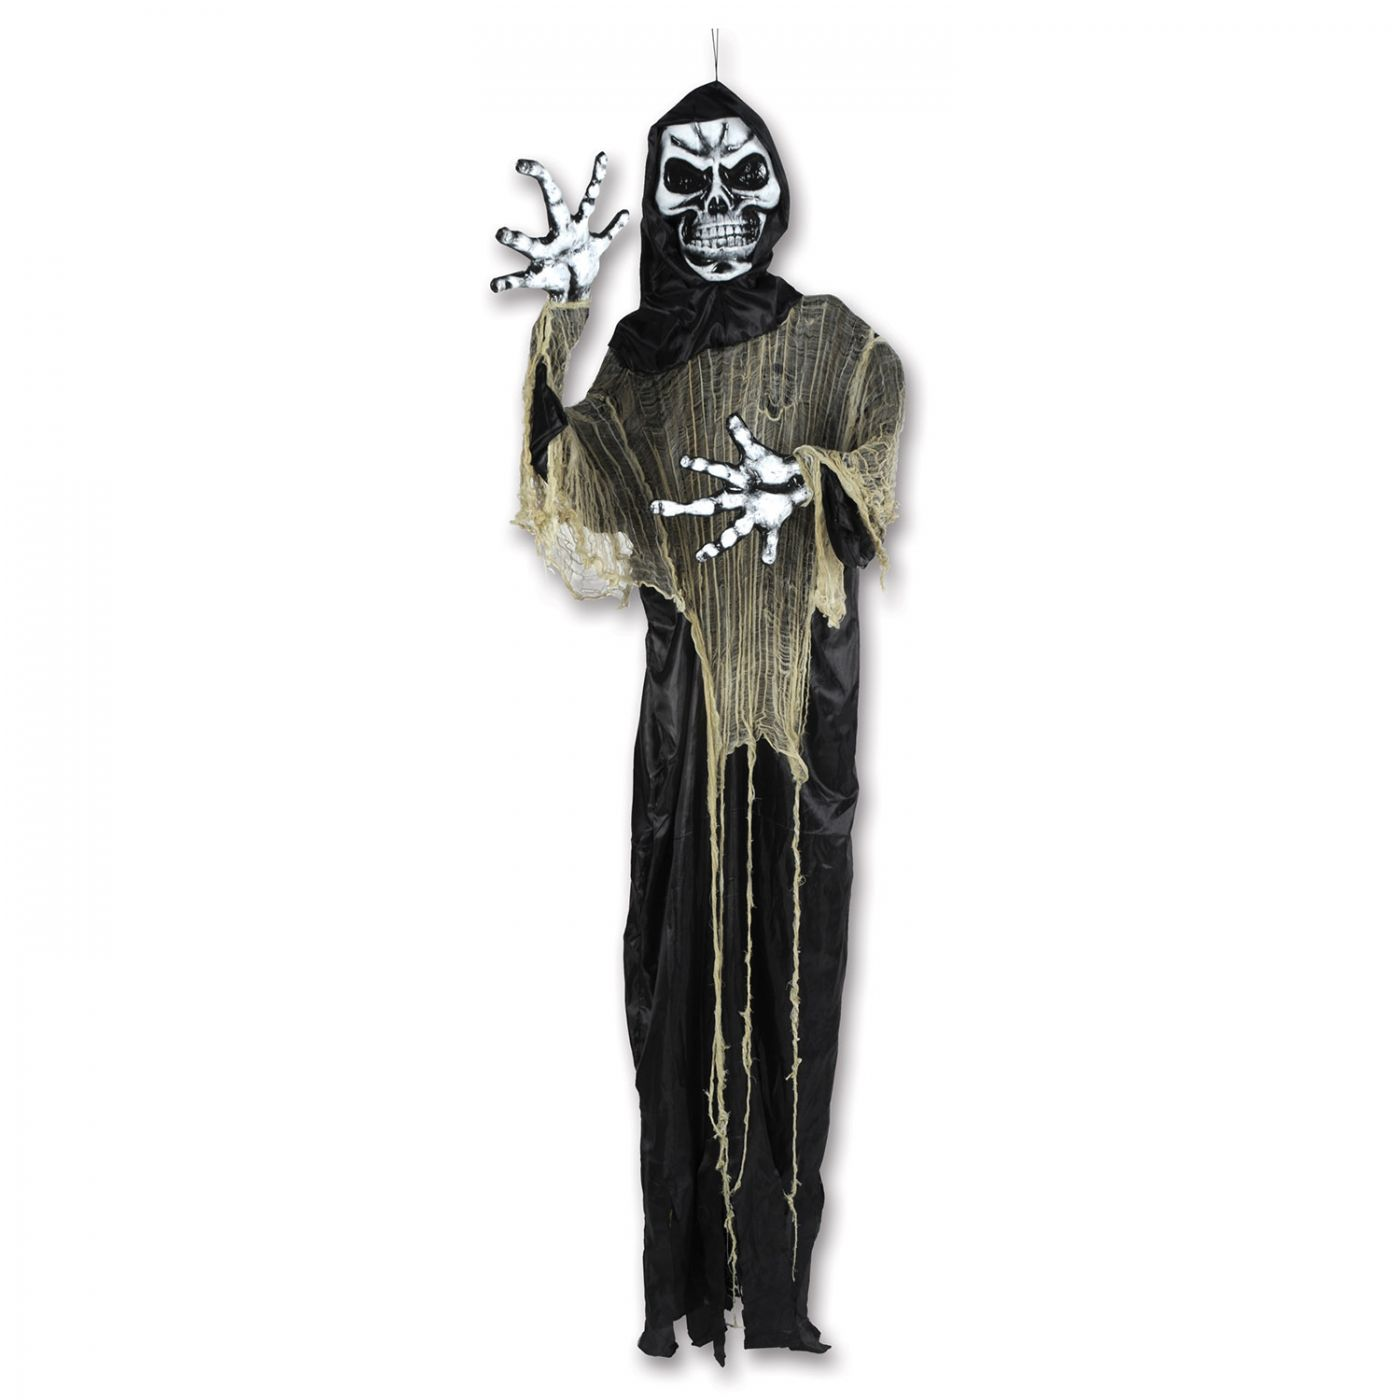 Reaper Creepy Creature (1) image